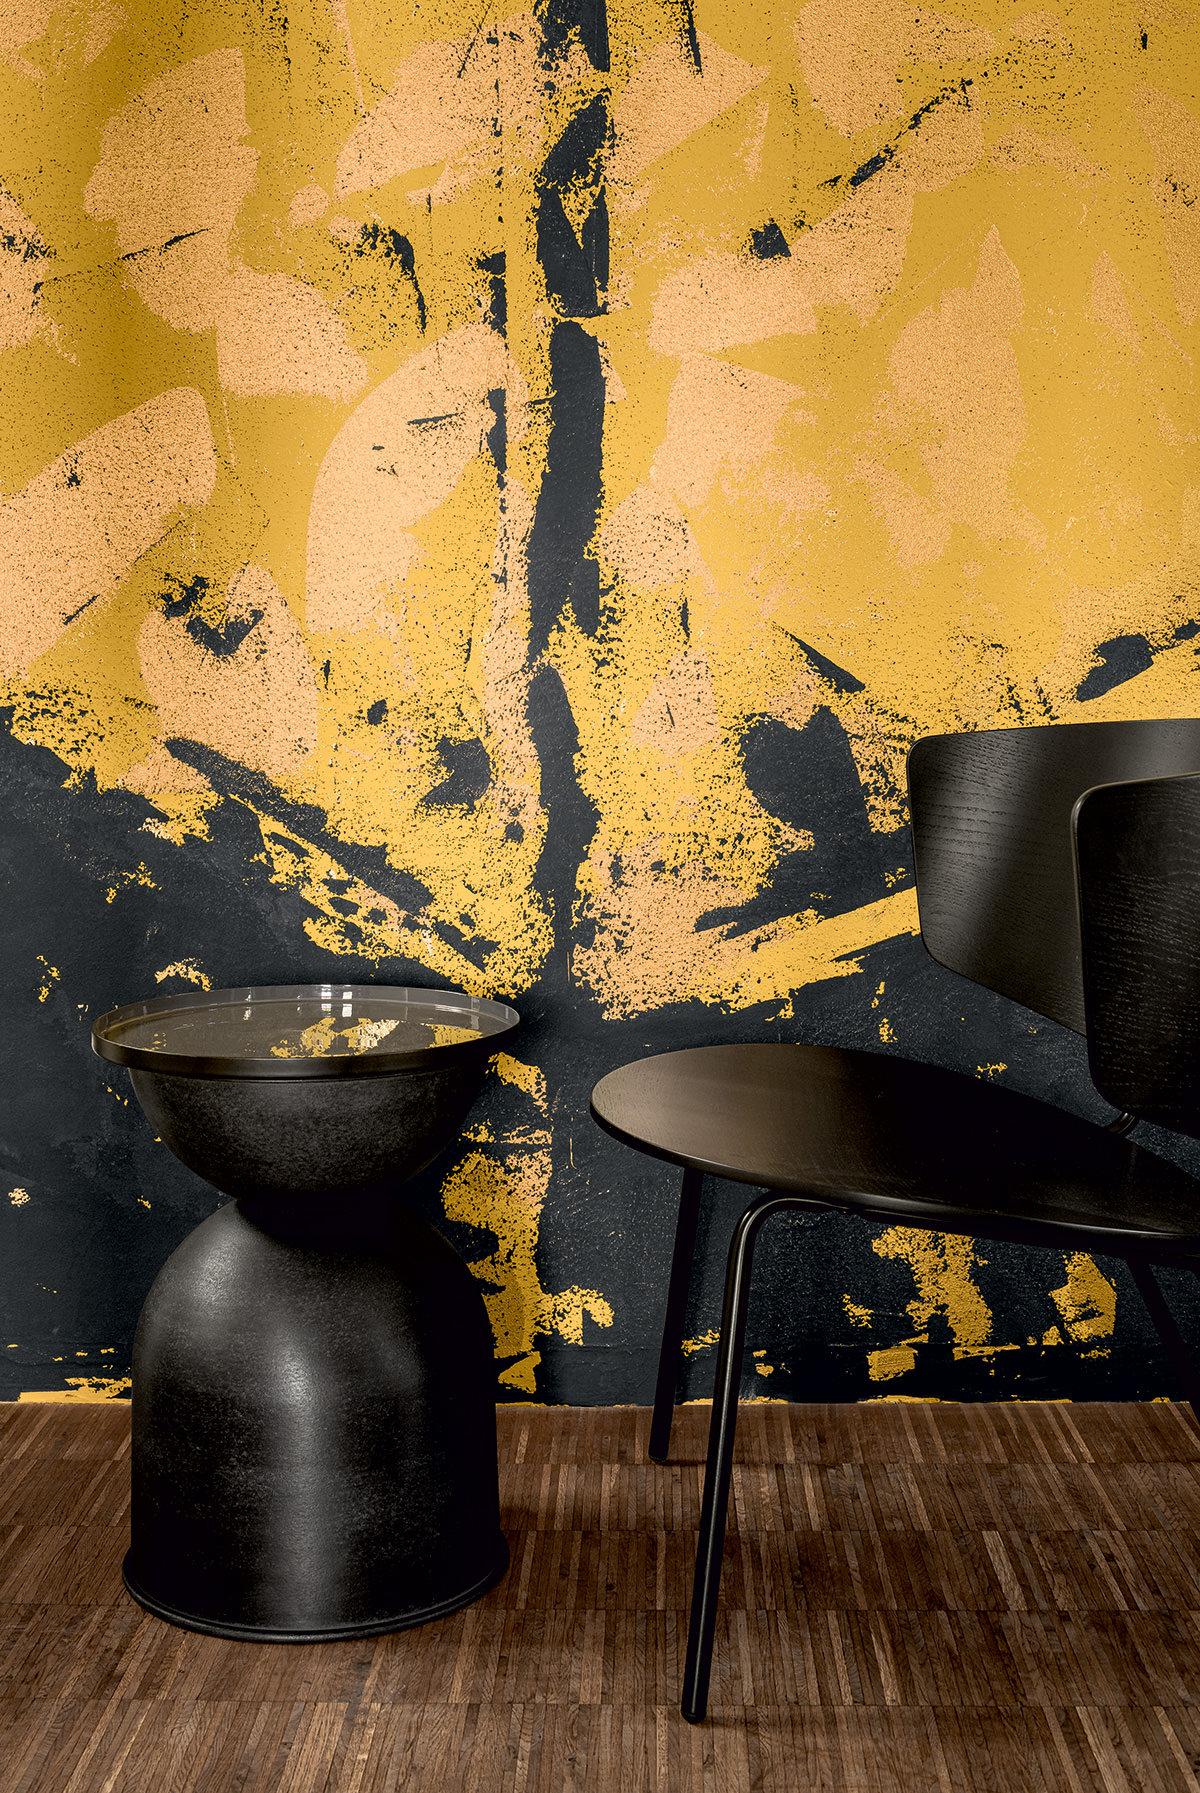 Experimentelle Oberfläche - Farben Palazzo und Amber